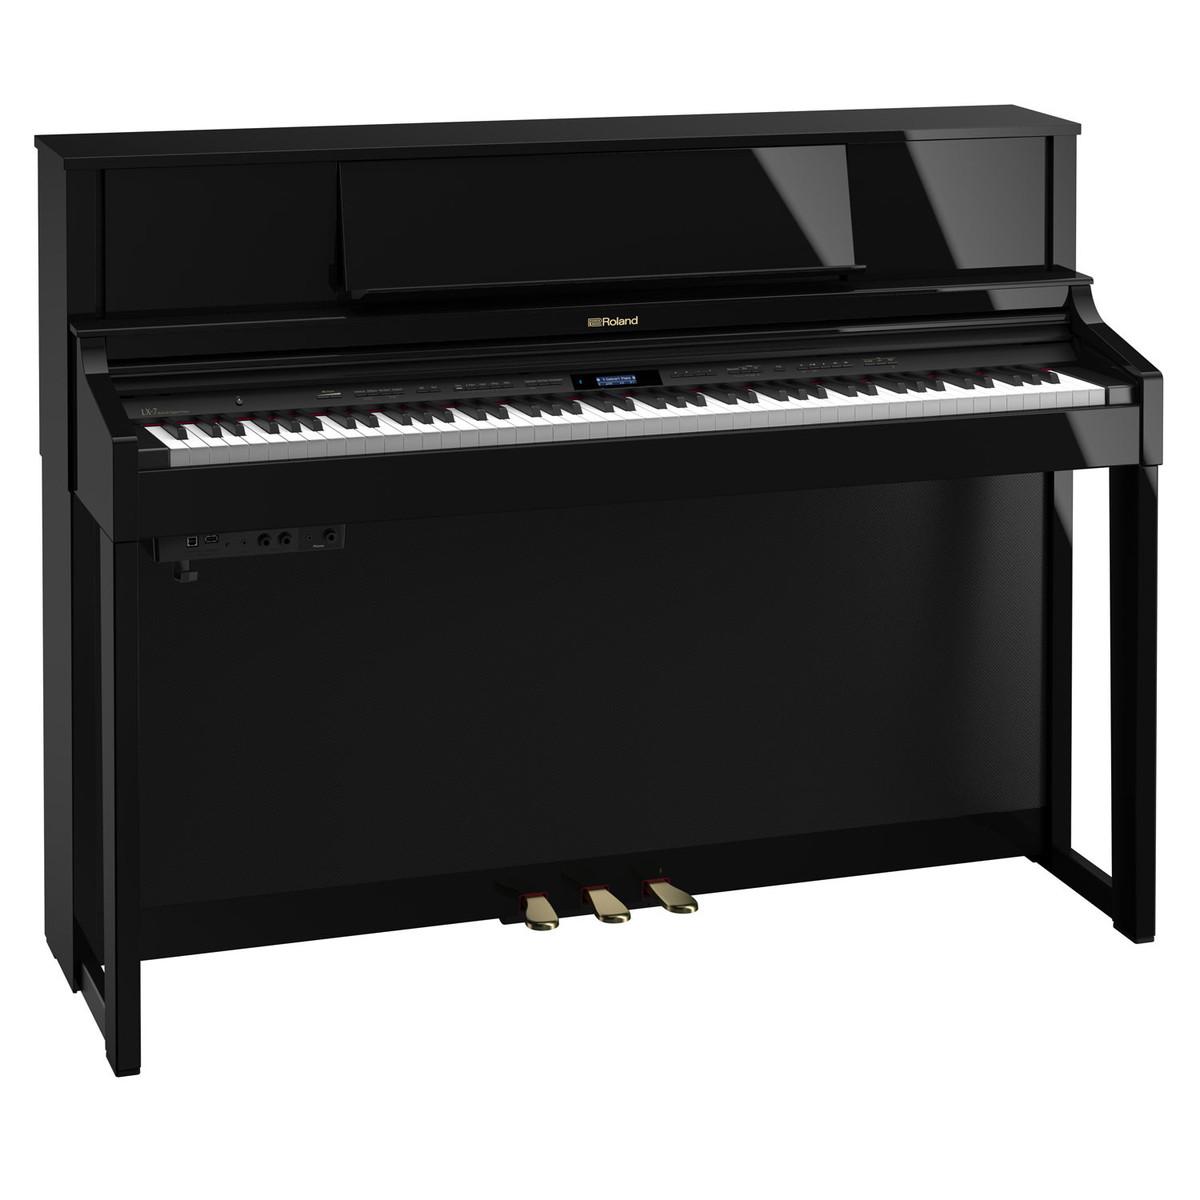 roland lx7 digital piano polished ebony at gear4music. Black Bedroom Furniture Sets. Home Design Ideas